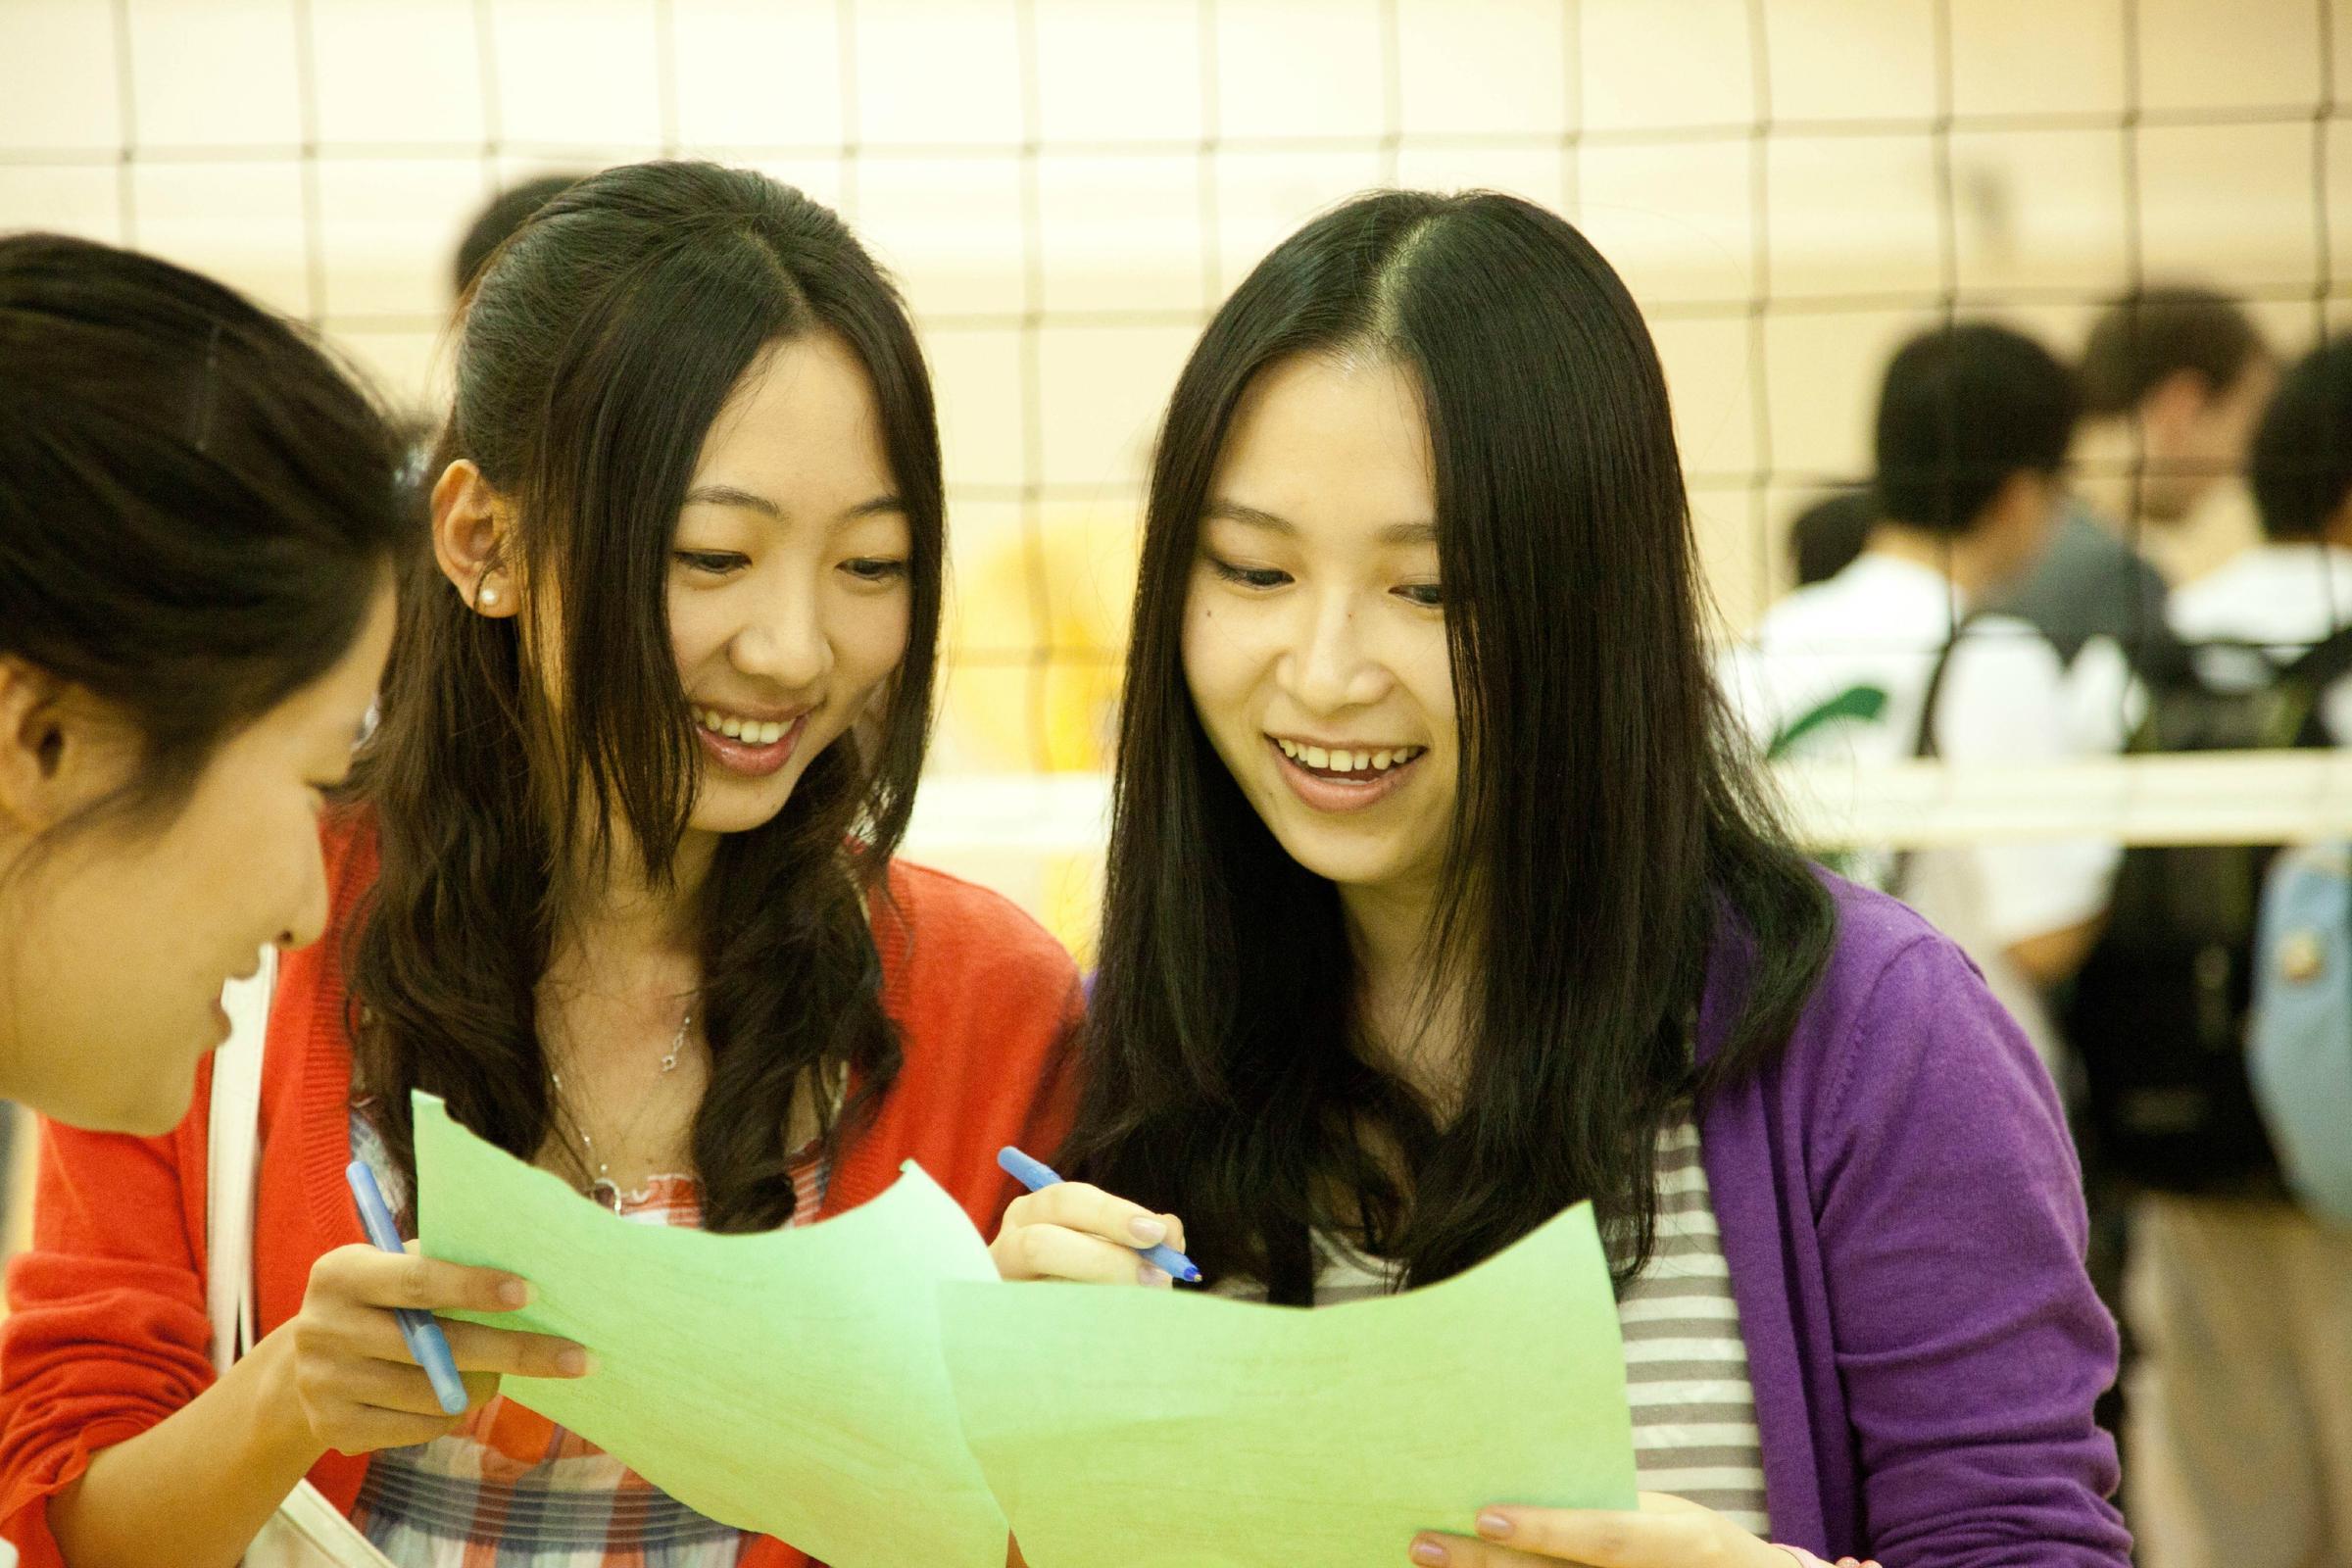 About Programs - Study Abroad | Montana State University